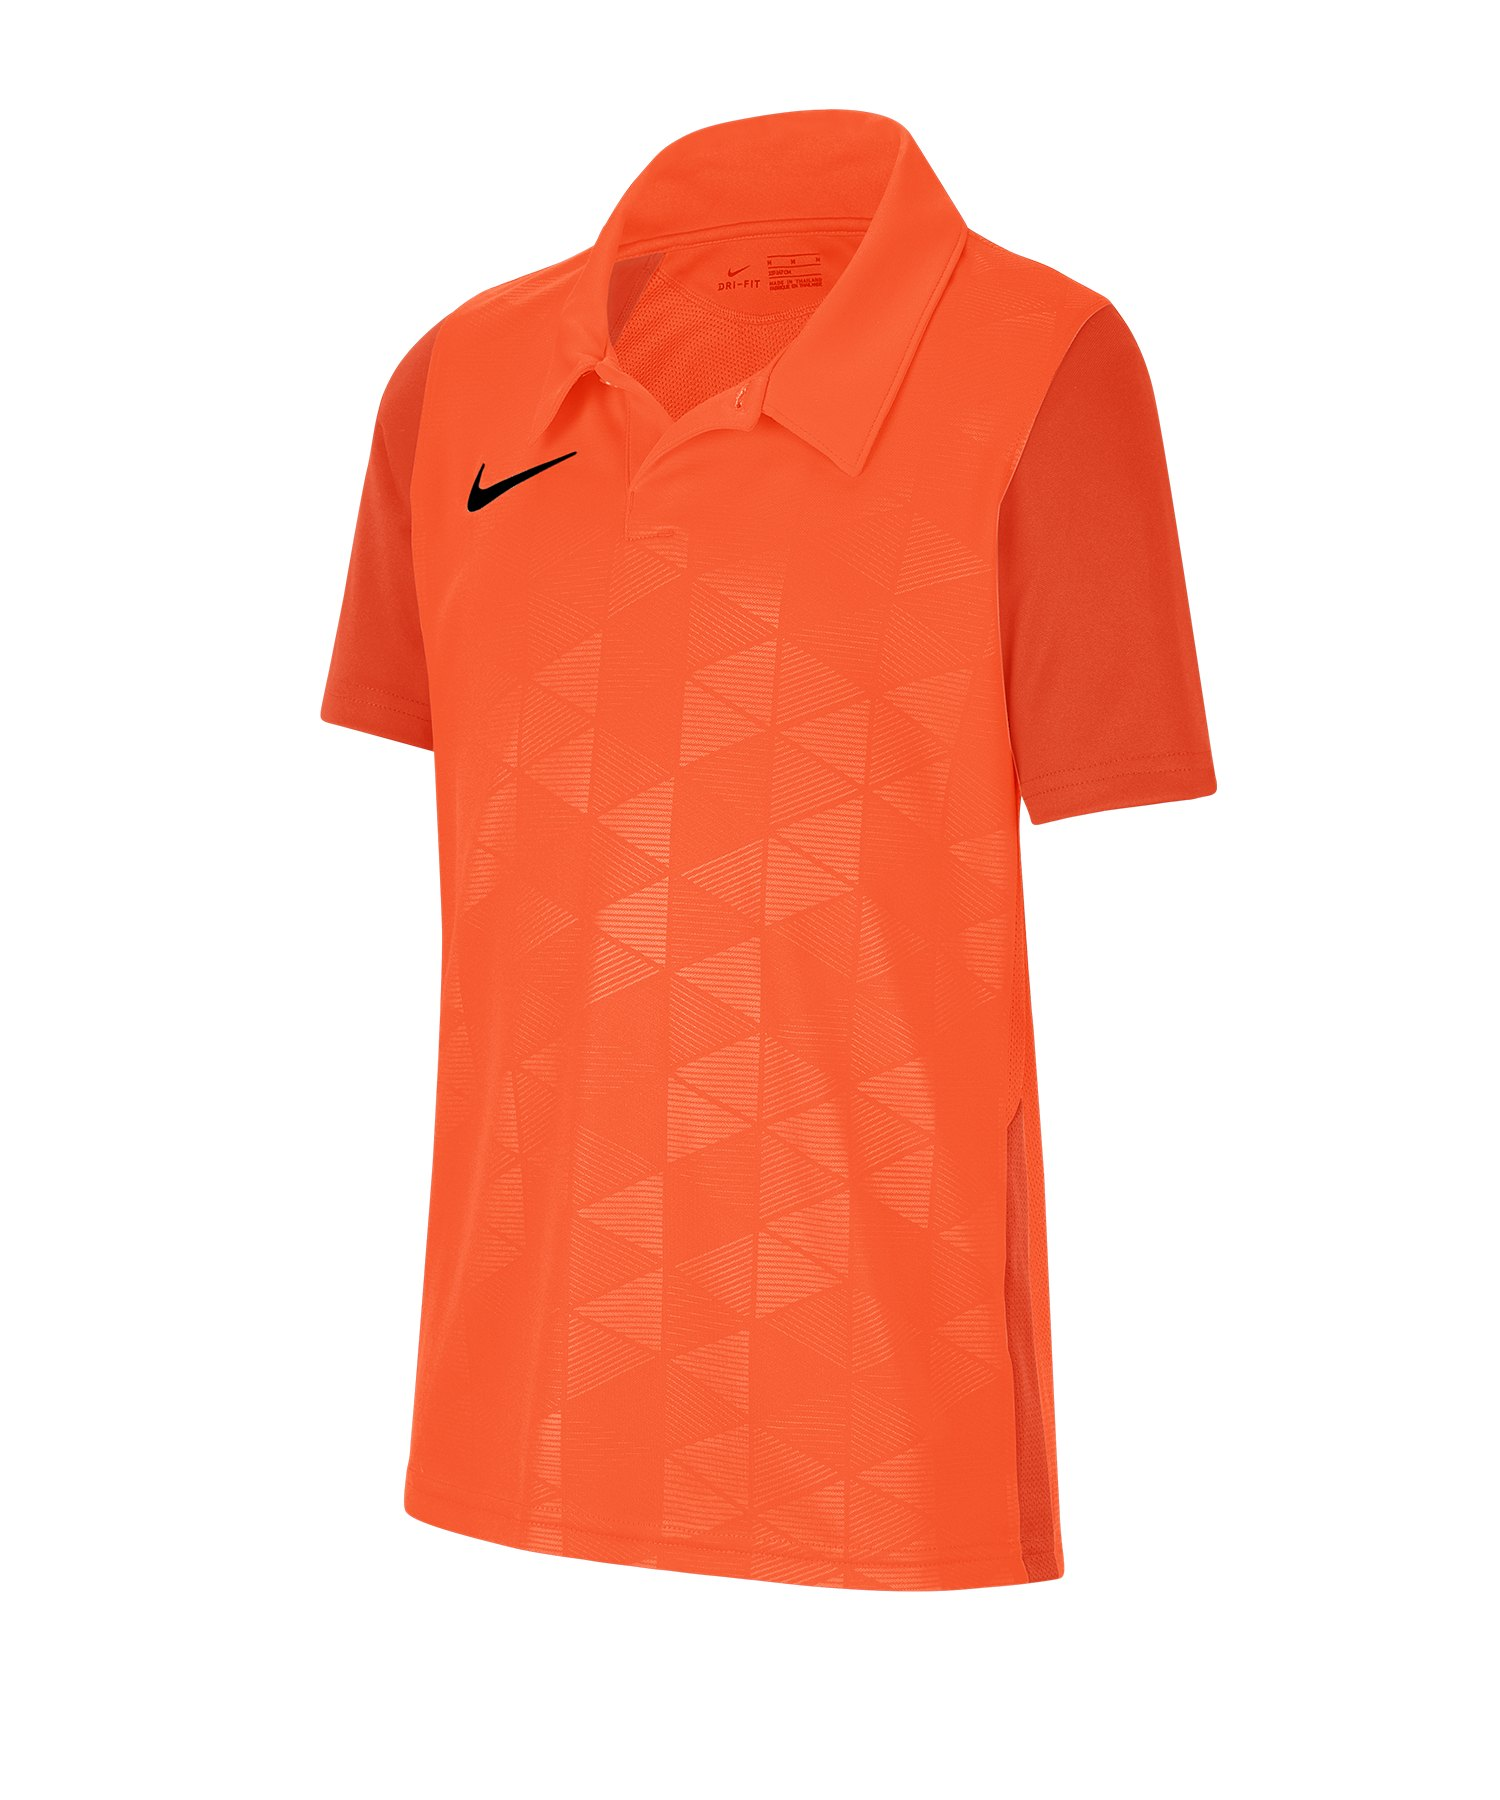 Nike Trophy IV Trikot kurzarm Kids Orange F819 - orange